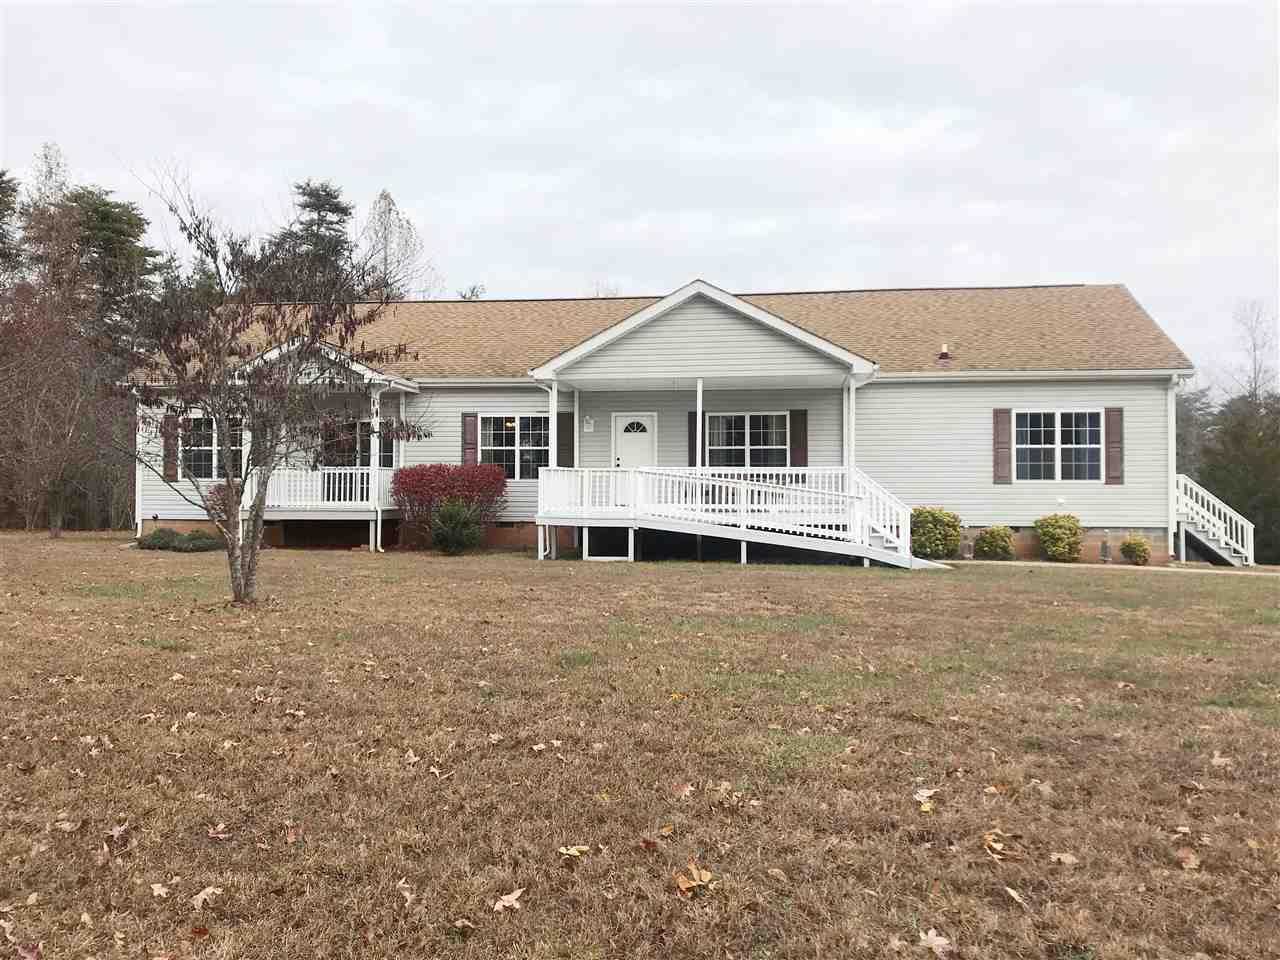 1724 MEHERRIN RD, MEHERRIN, VA 23954